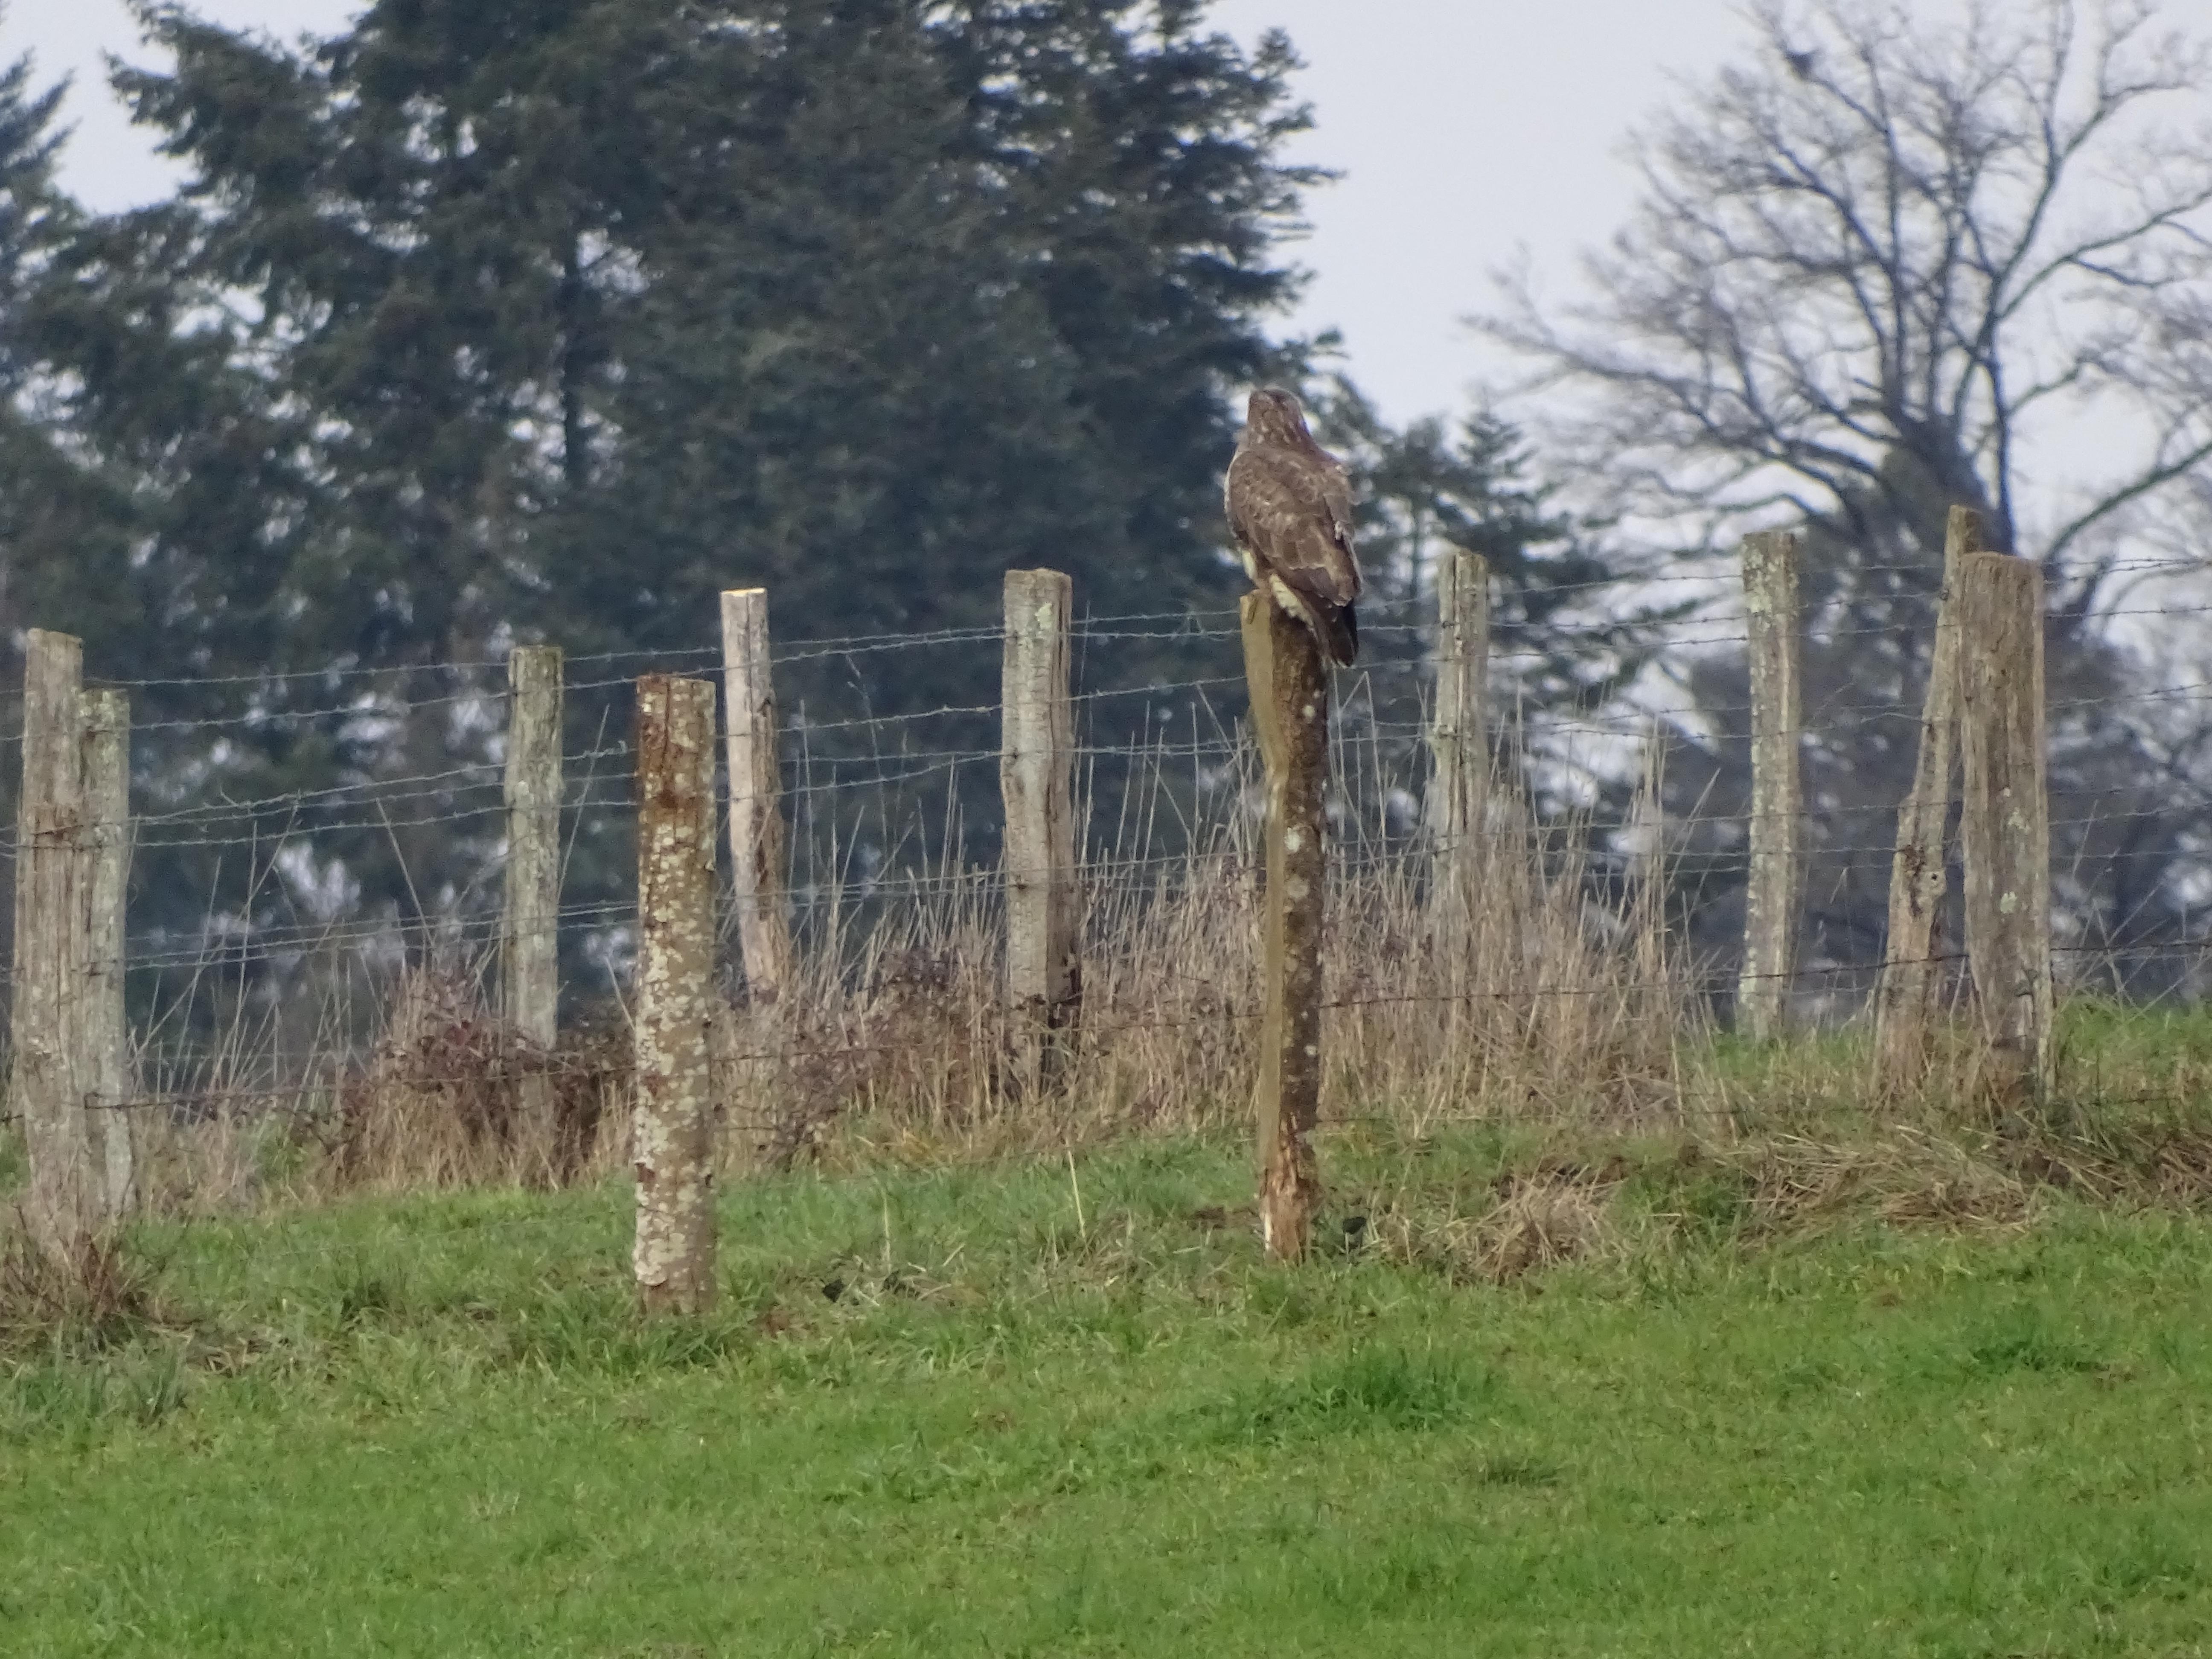 Bird of prey sat on a fence post in a farmers field